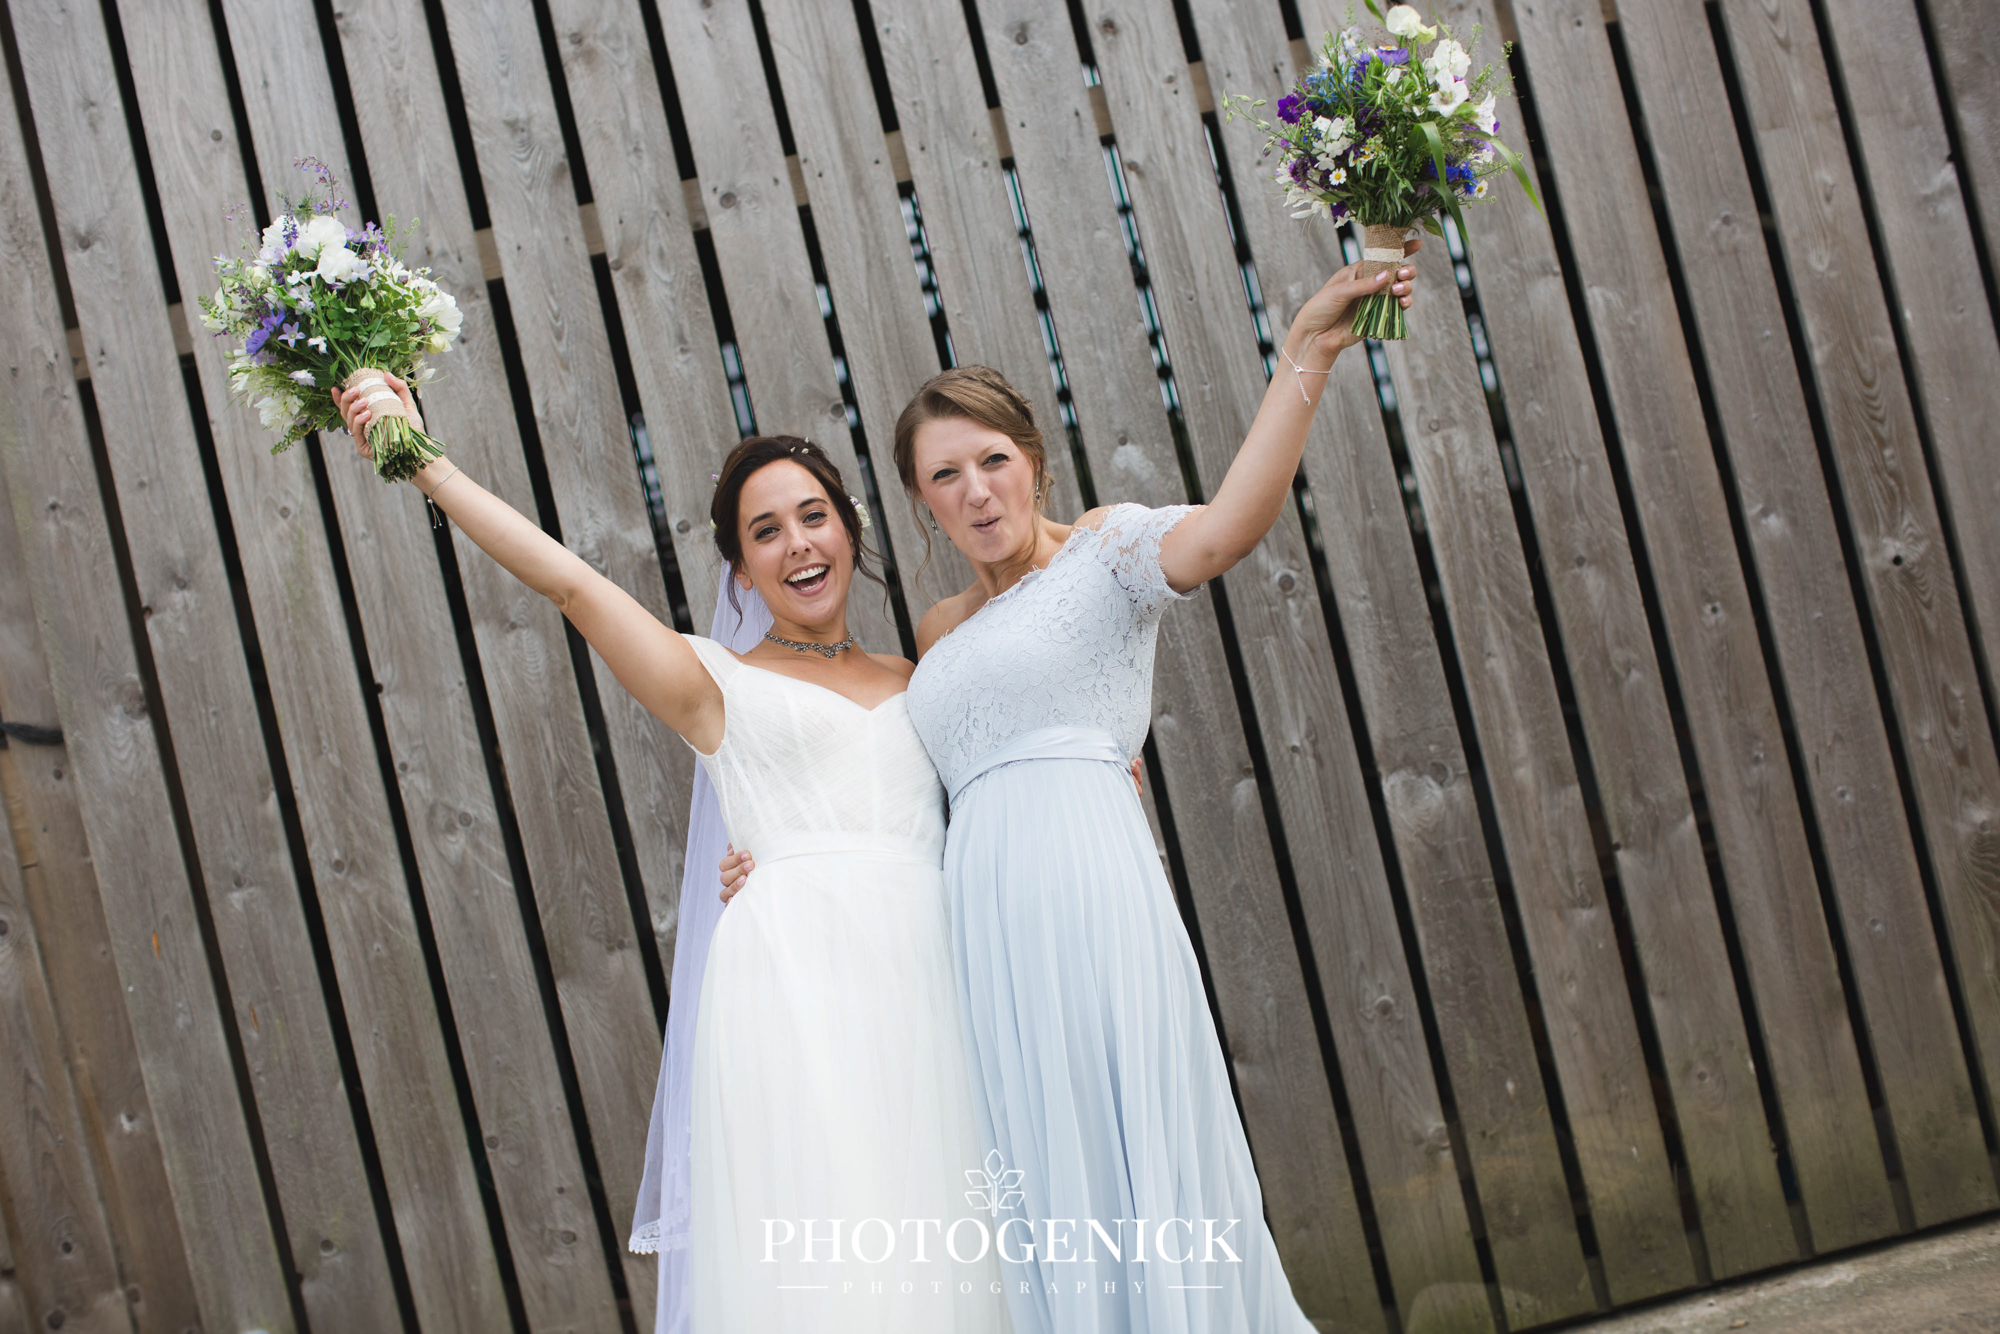 oldwalls gower wedding photographers-32.jpg